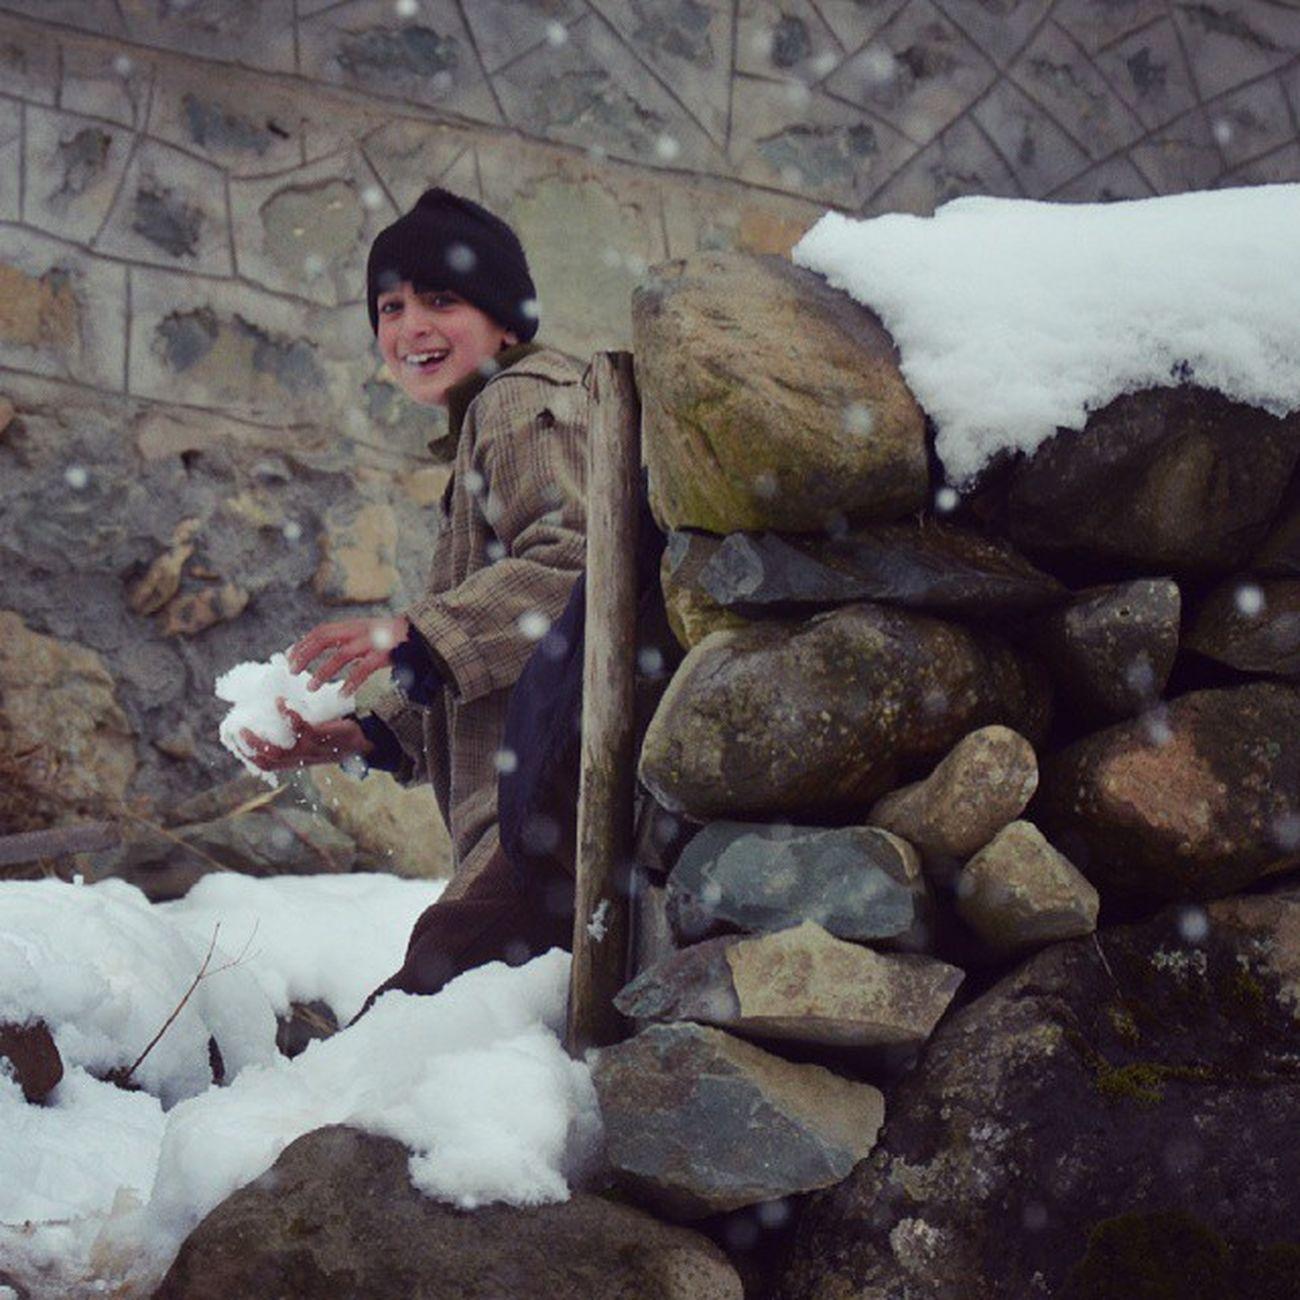 Snowfight SheenEjung MilitaryTactics Cover Bunker Target CameraWoulLadke Kasheer Kashmir KashmirTalks IExplore IExploreKashmir IPhotographKashmir Itravel Iphotograph Iclick IAmRevo IAmKashmir Revoshotsphotography Revoshots Rebel Revo Freedom Happiness